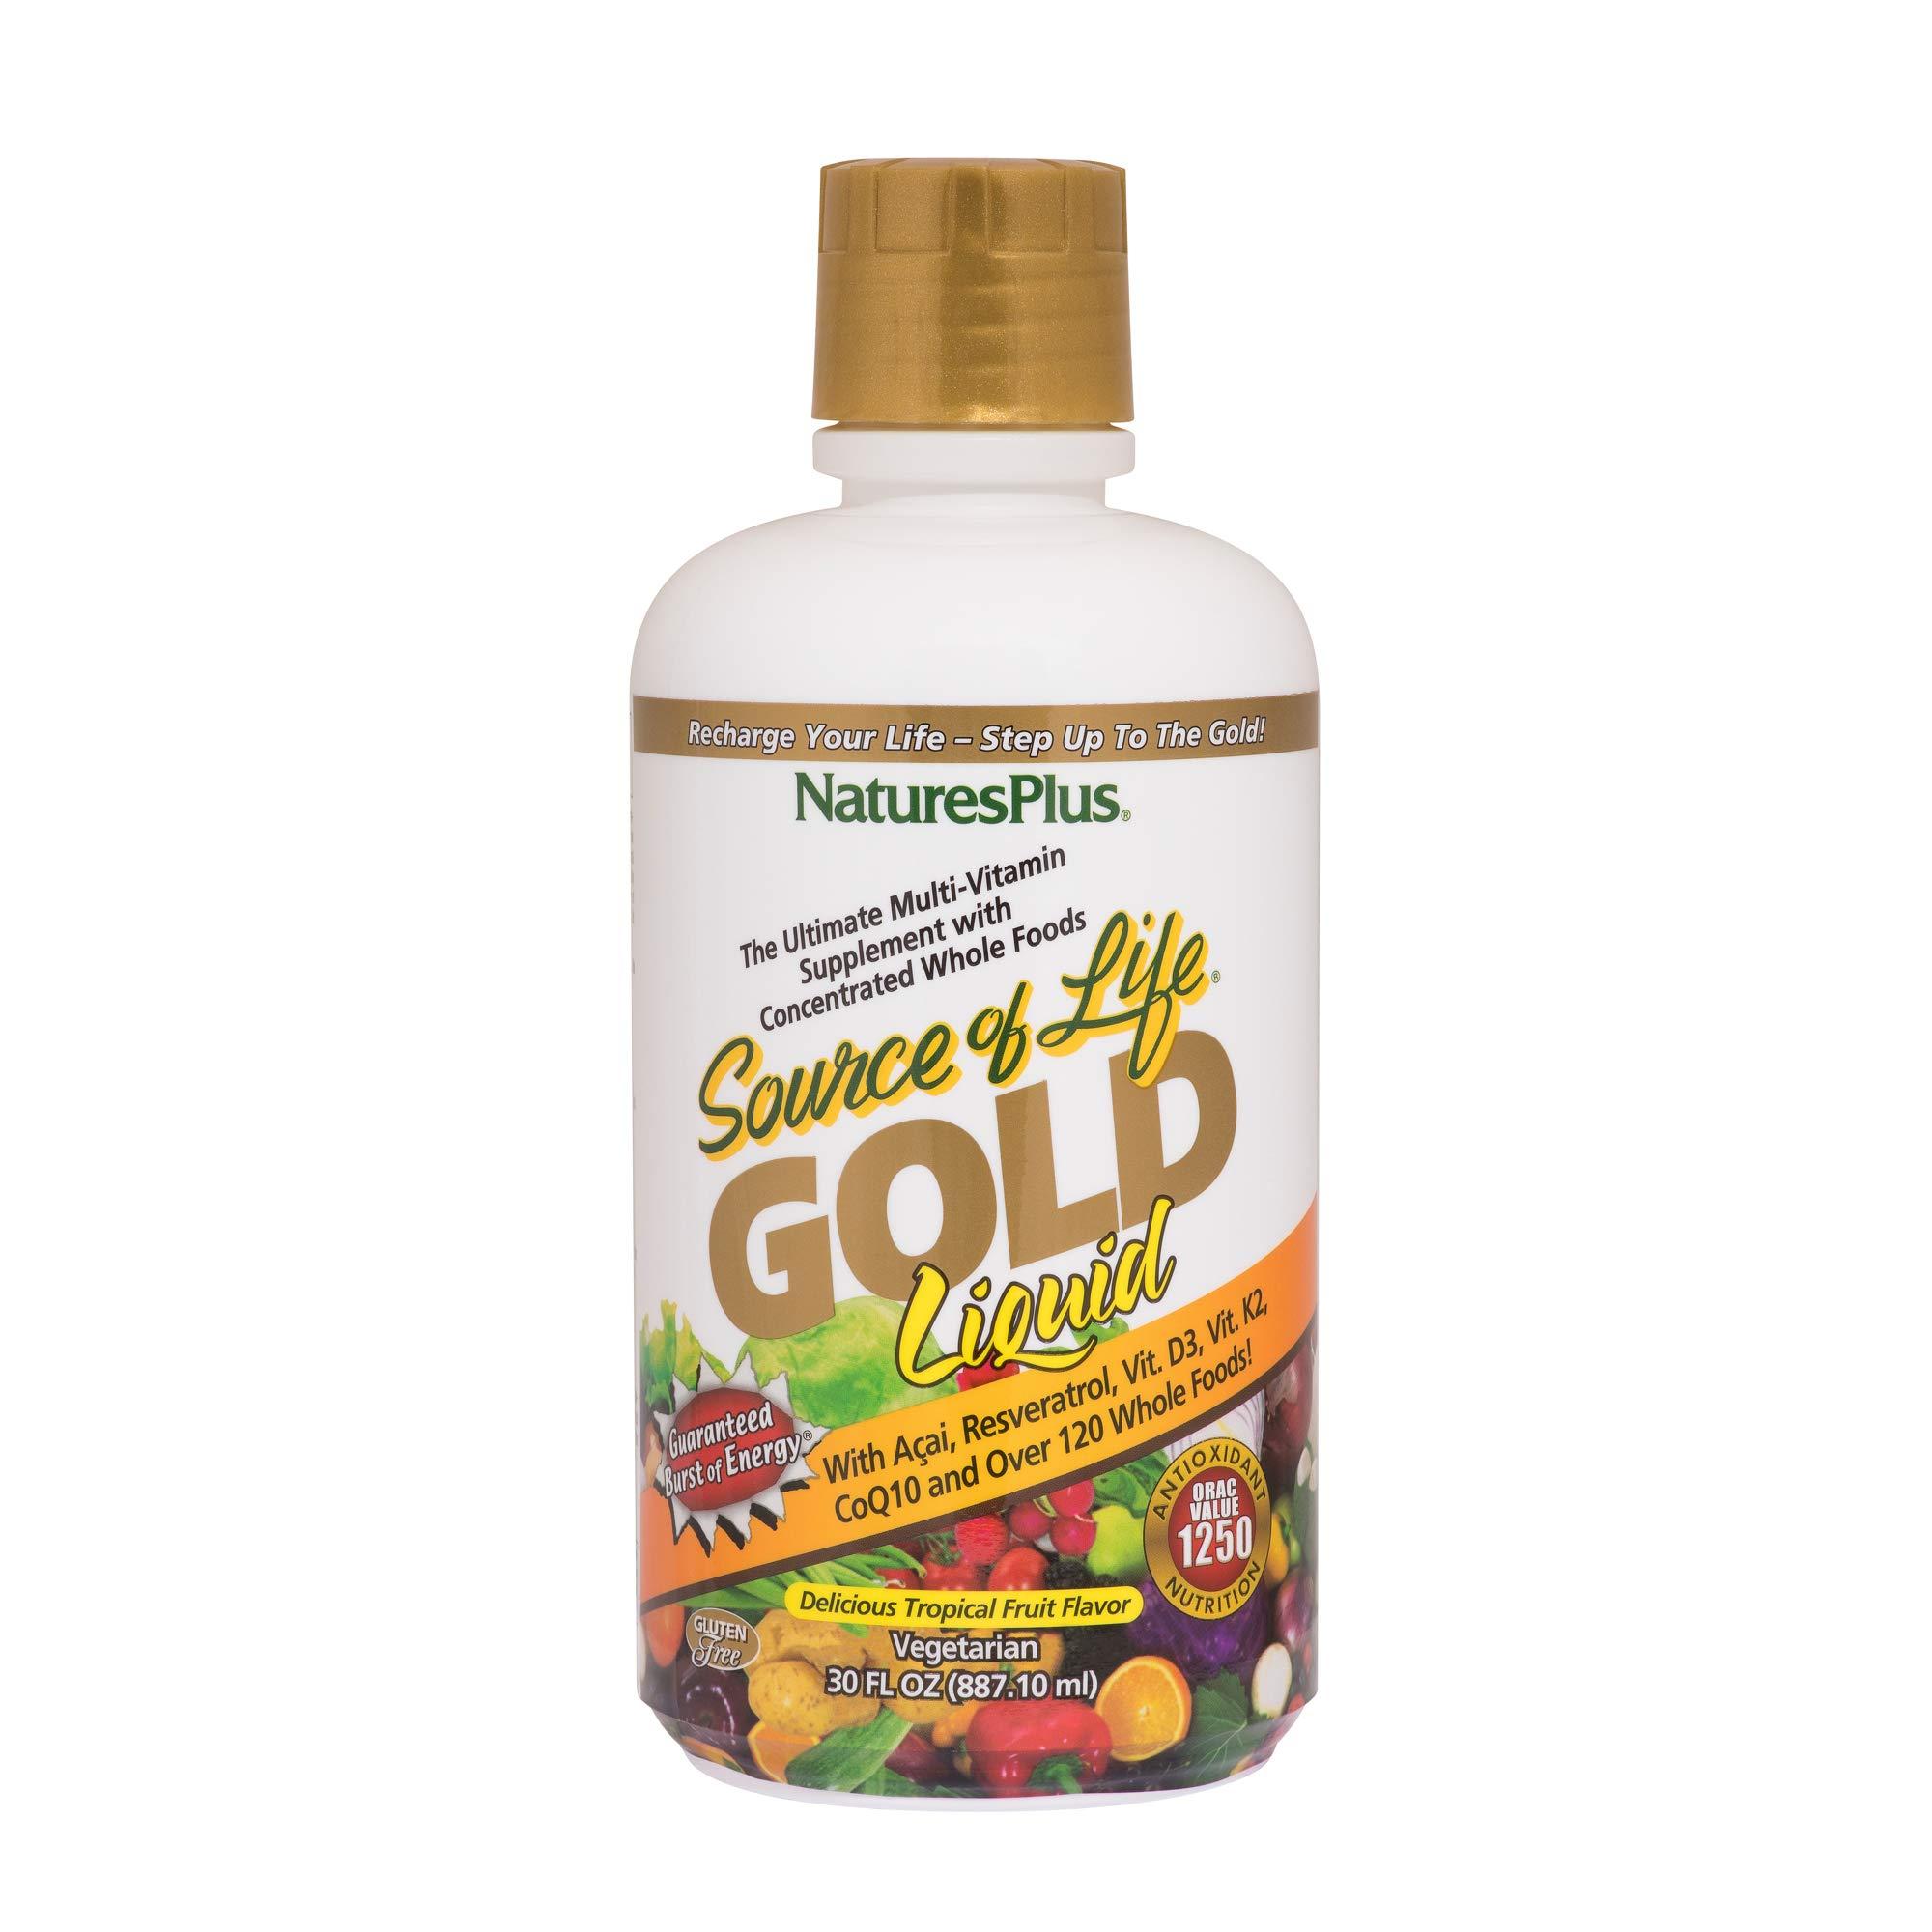 NaturesPlus Source of Life Gold Liquid - 30 fl oz - Tropical Fruit Flavor - Daily High Potency, Organic Whole Food Multivitamin, Prebiotic Complex - Vegetarian, Gluten-Free - 30 Servings